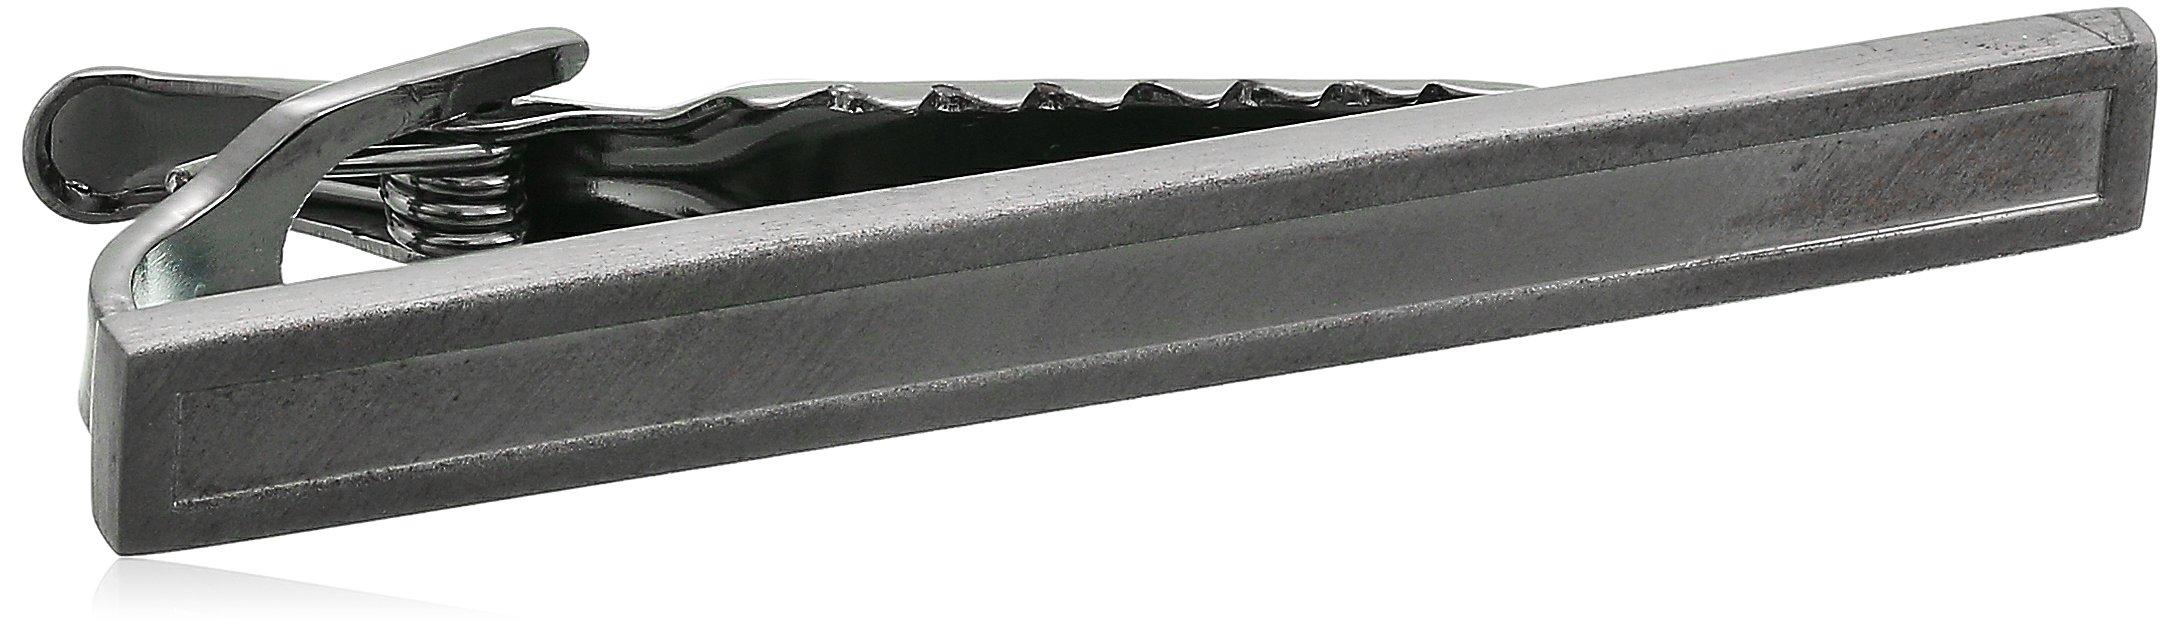 Kenneth Cole REACTION Men's Classic Tie Clip, gunmetal, One Size